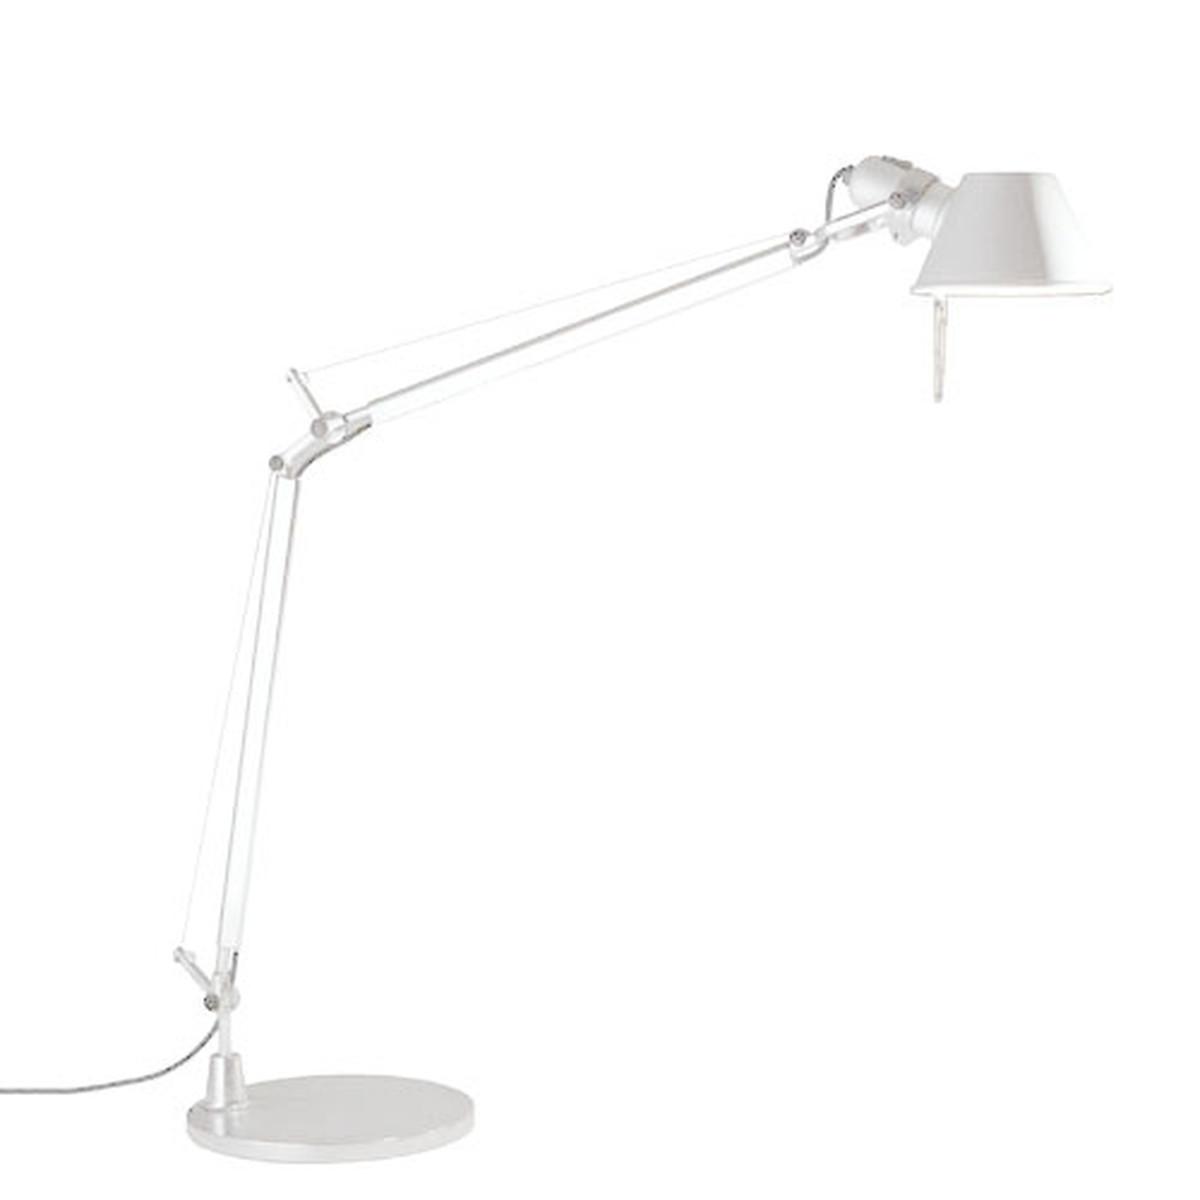 Artemide Tolomeo - (write) white table lamp - Artemide Tolomeo Desk Lamp